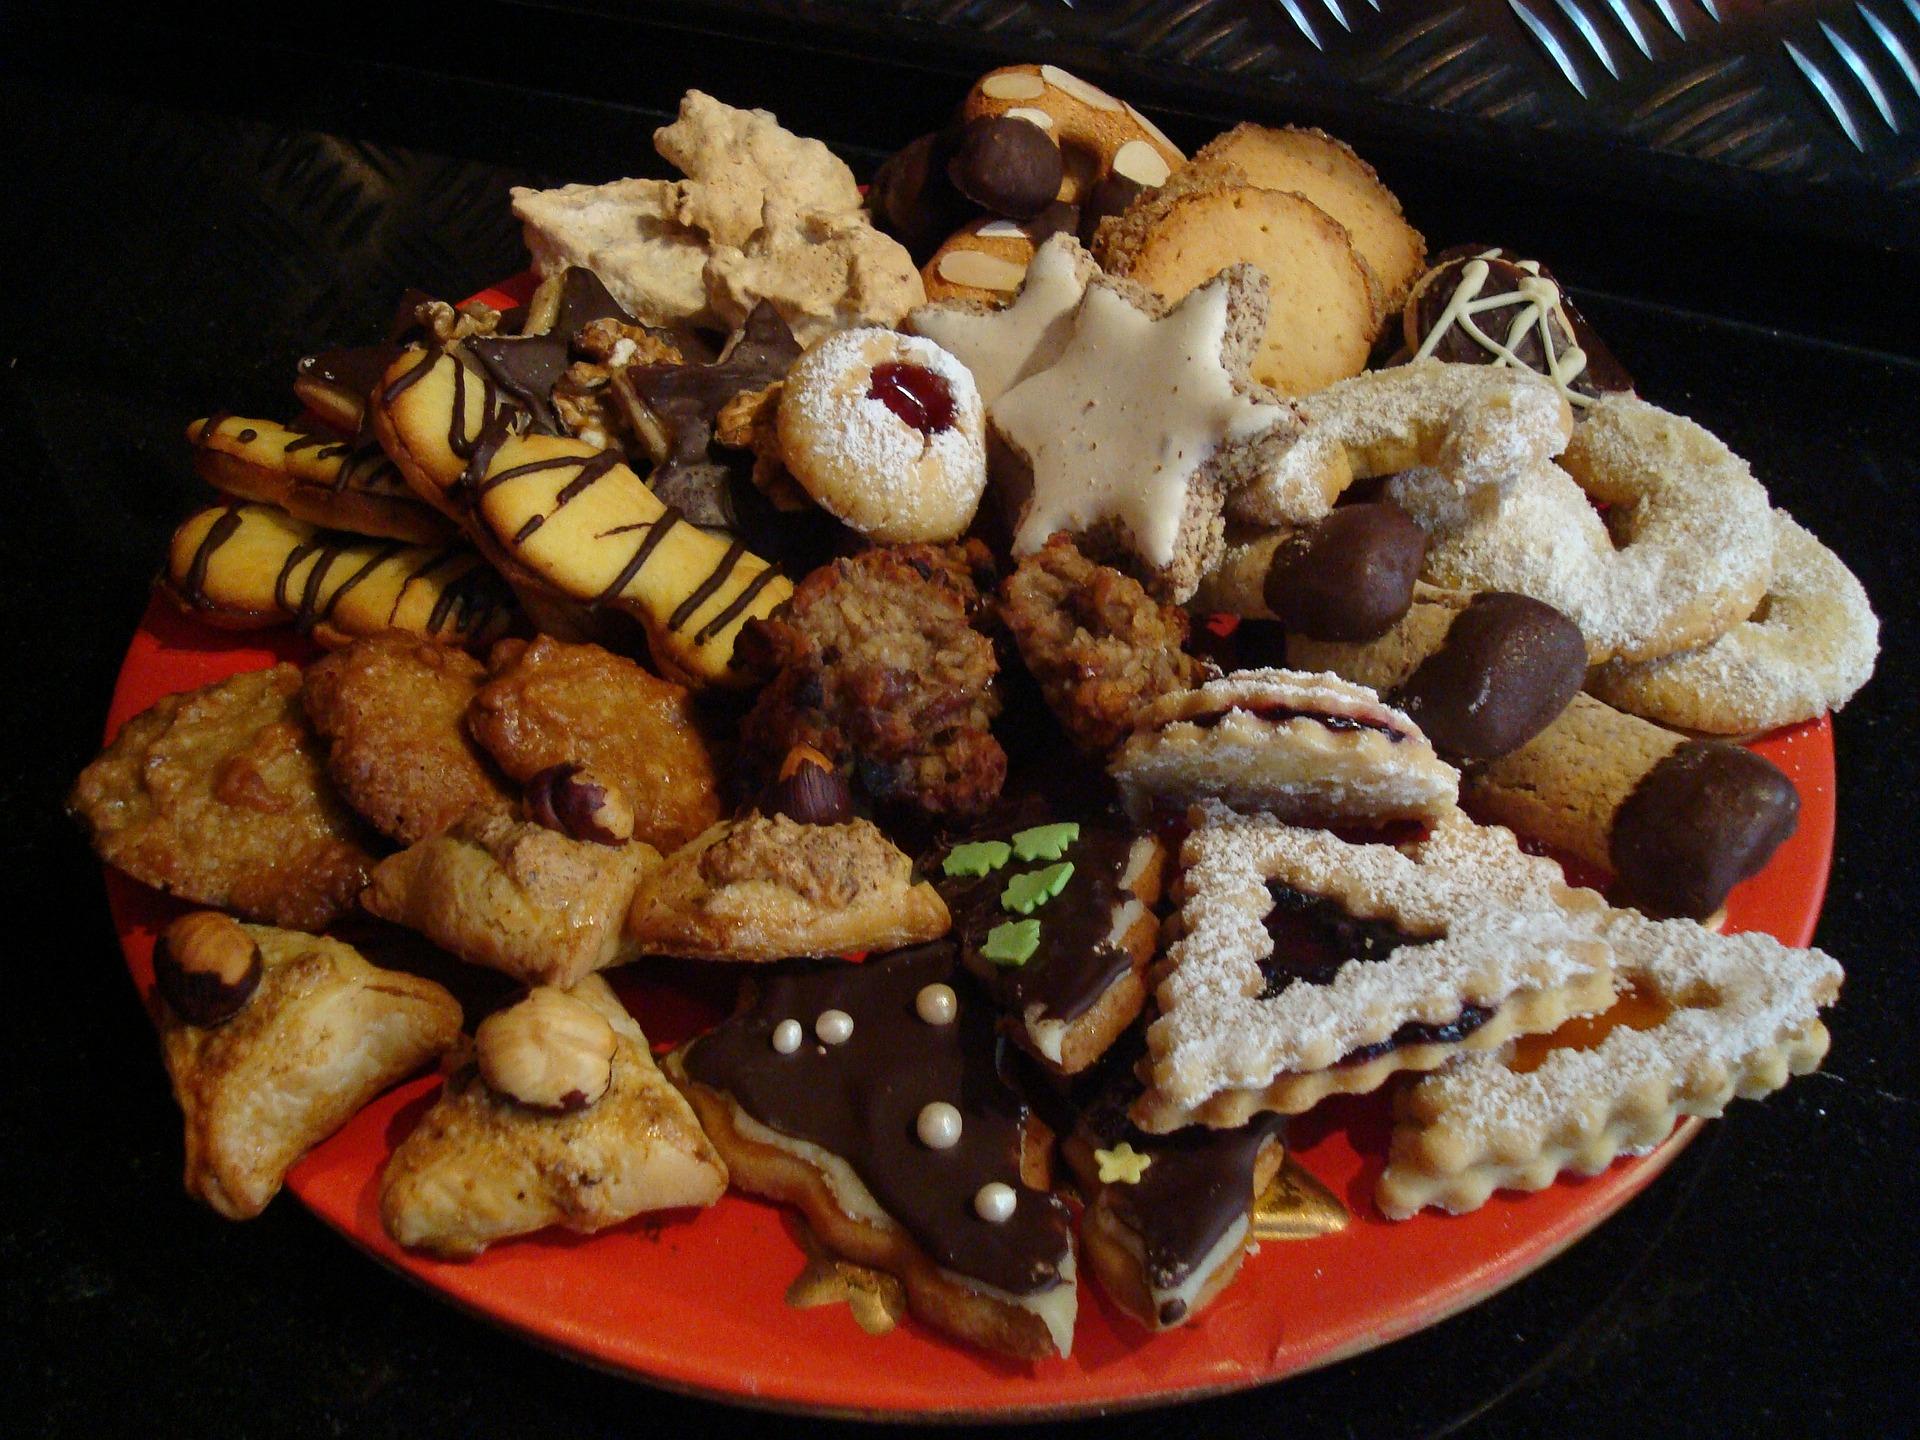 cookies-210718_1920